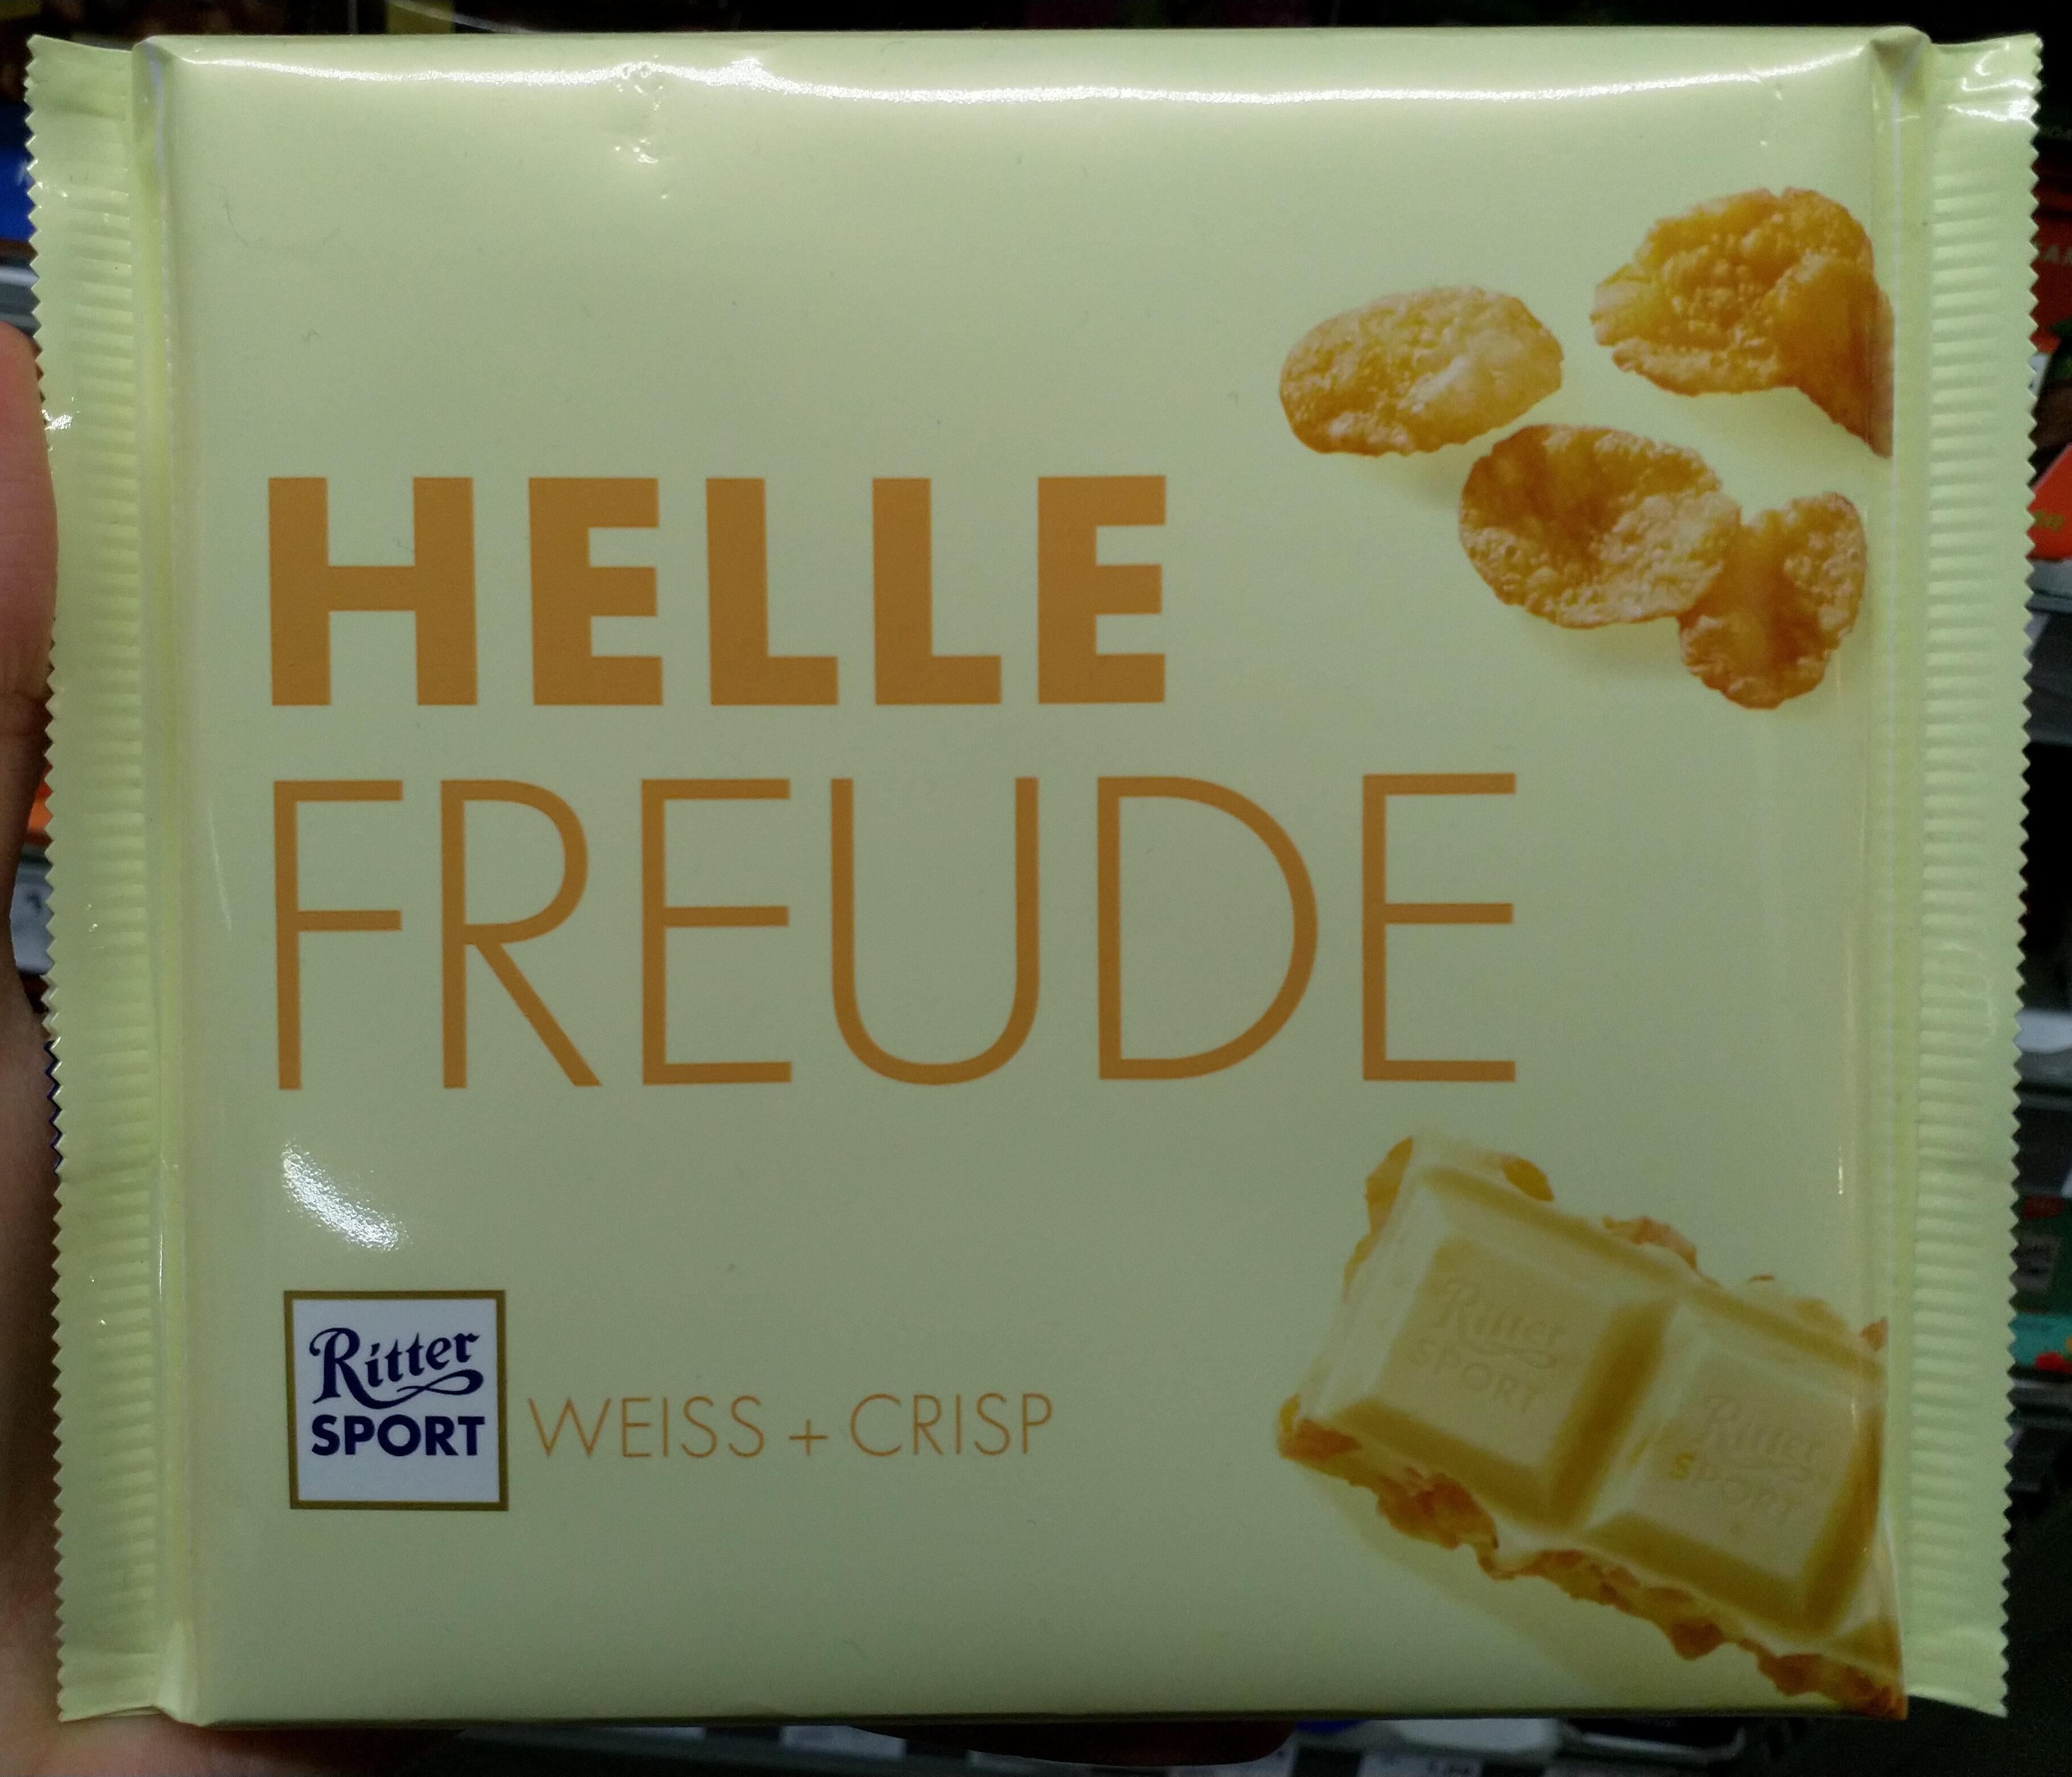 Helle Freude Weiß + Crisp - Product